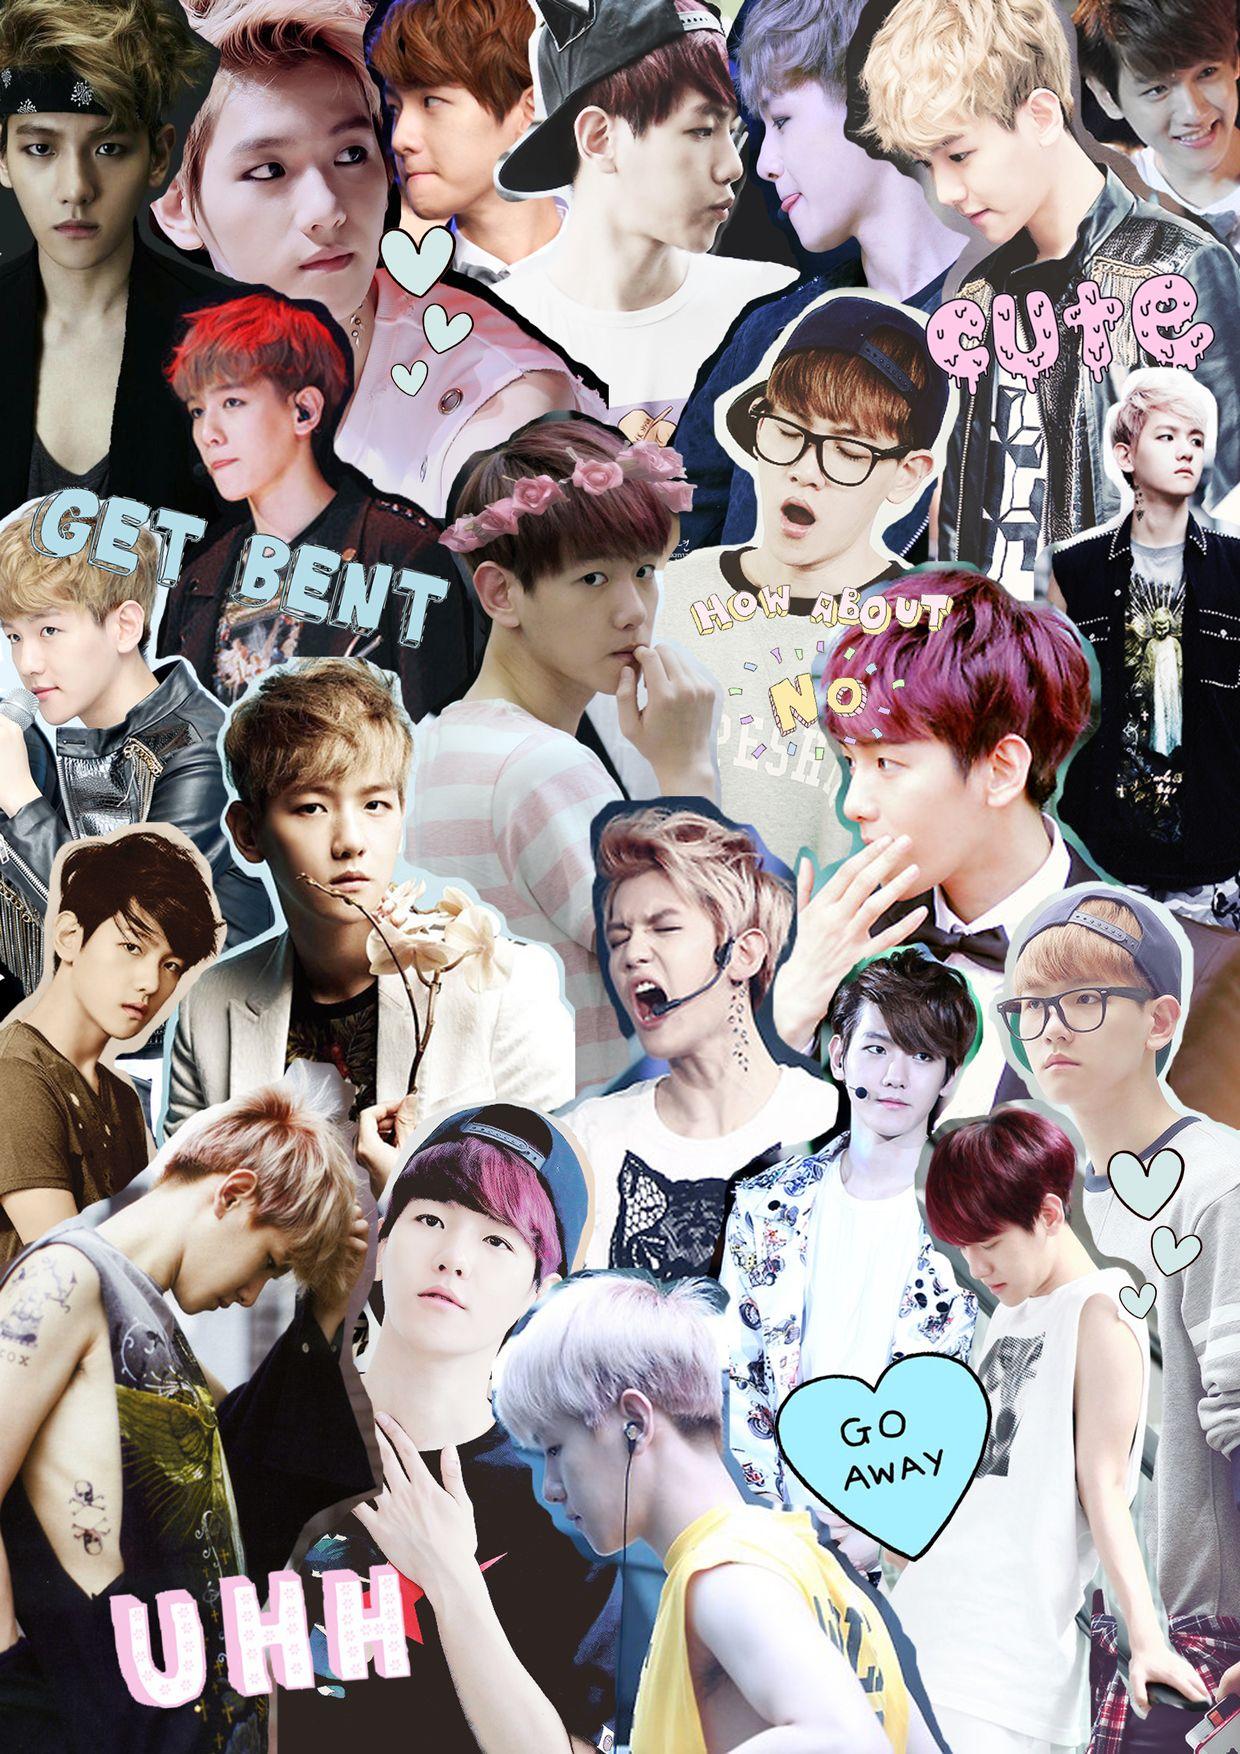 baekhyun exo collage wallpapers walls